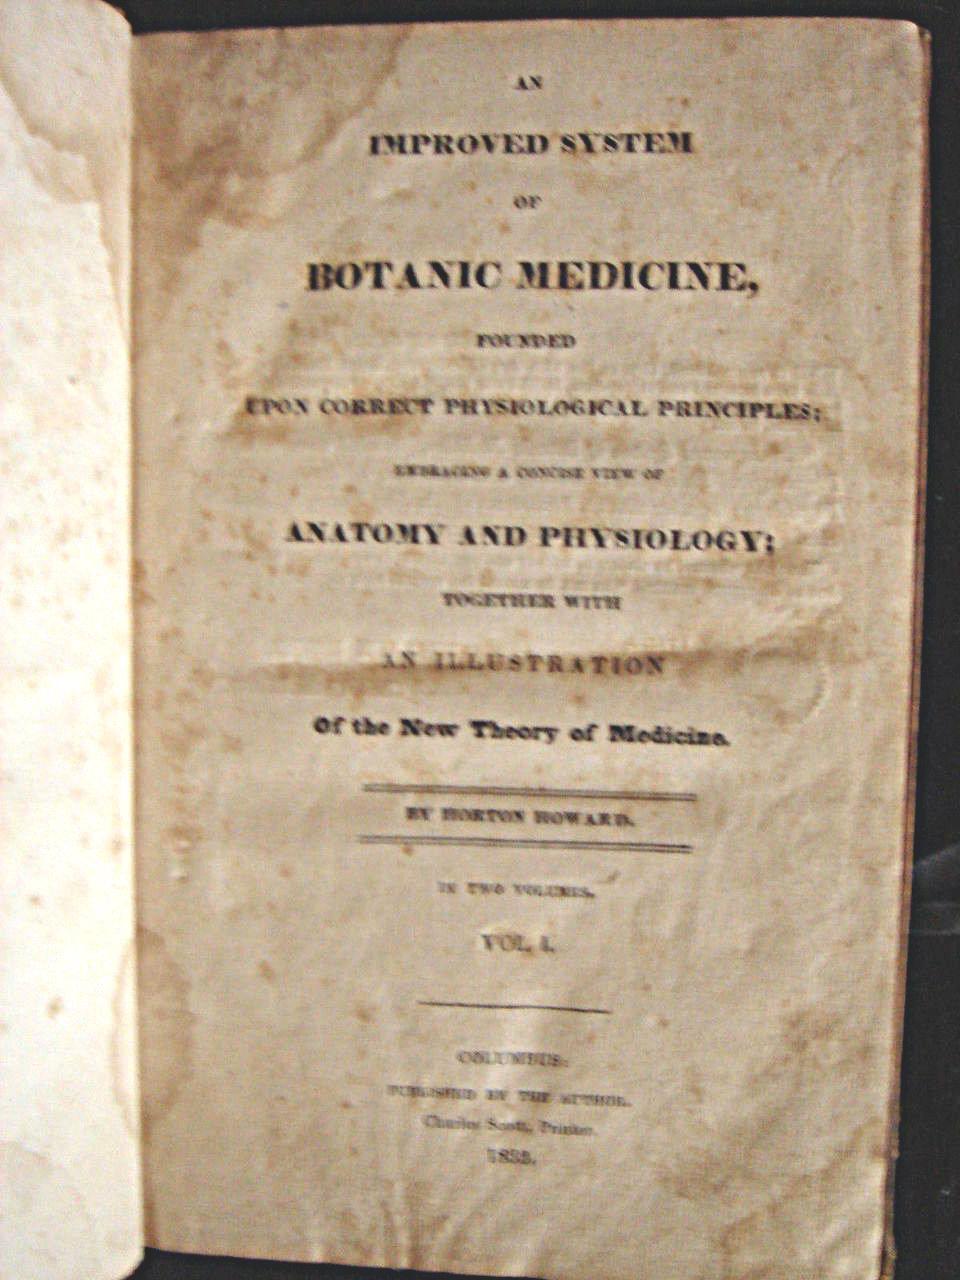 AN IMPROVED SYSTEM OF BOTANIC MEDICINE, by Horton Howard - 1832